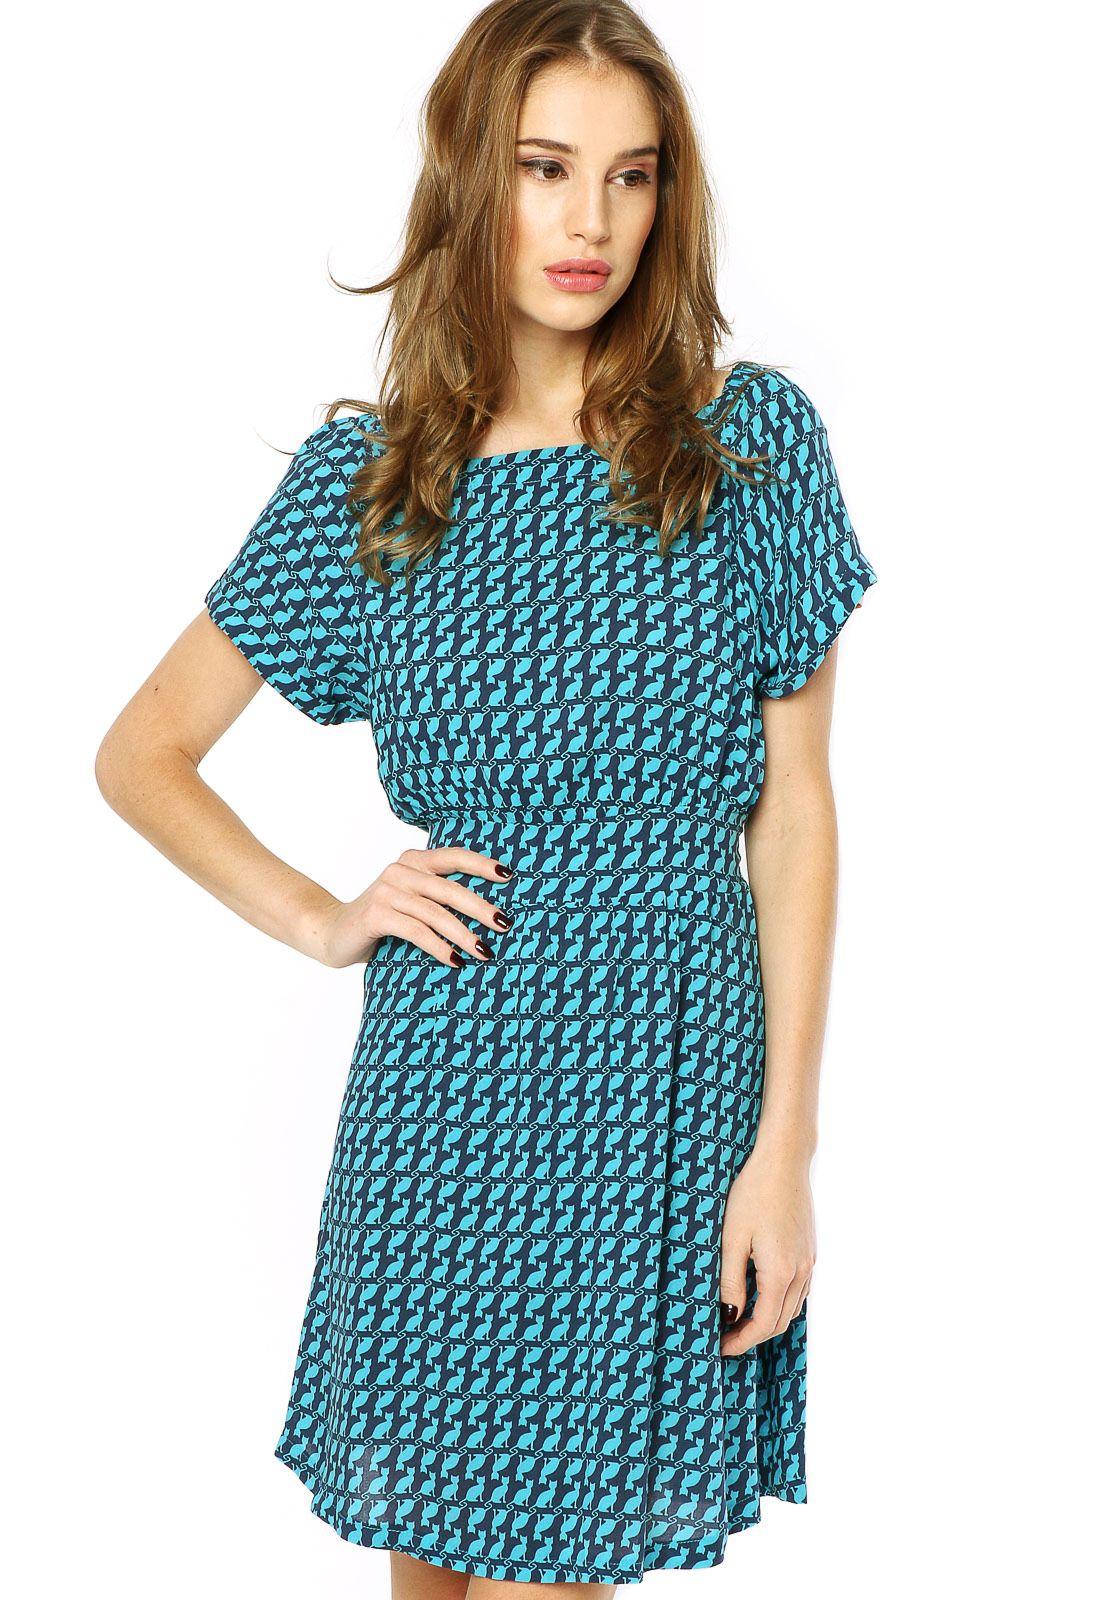 ebeab11368 Vestido Mercatto Tecido Estampado Azul - Compre Agora